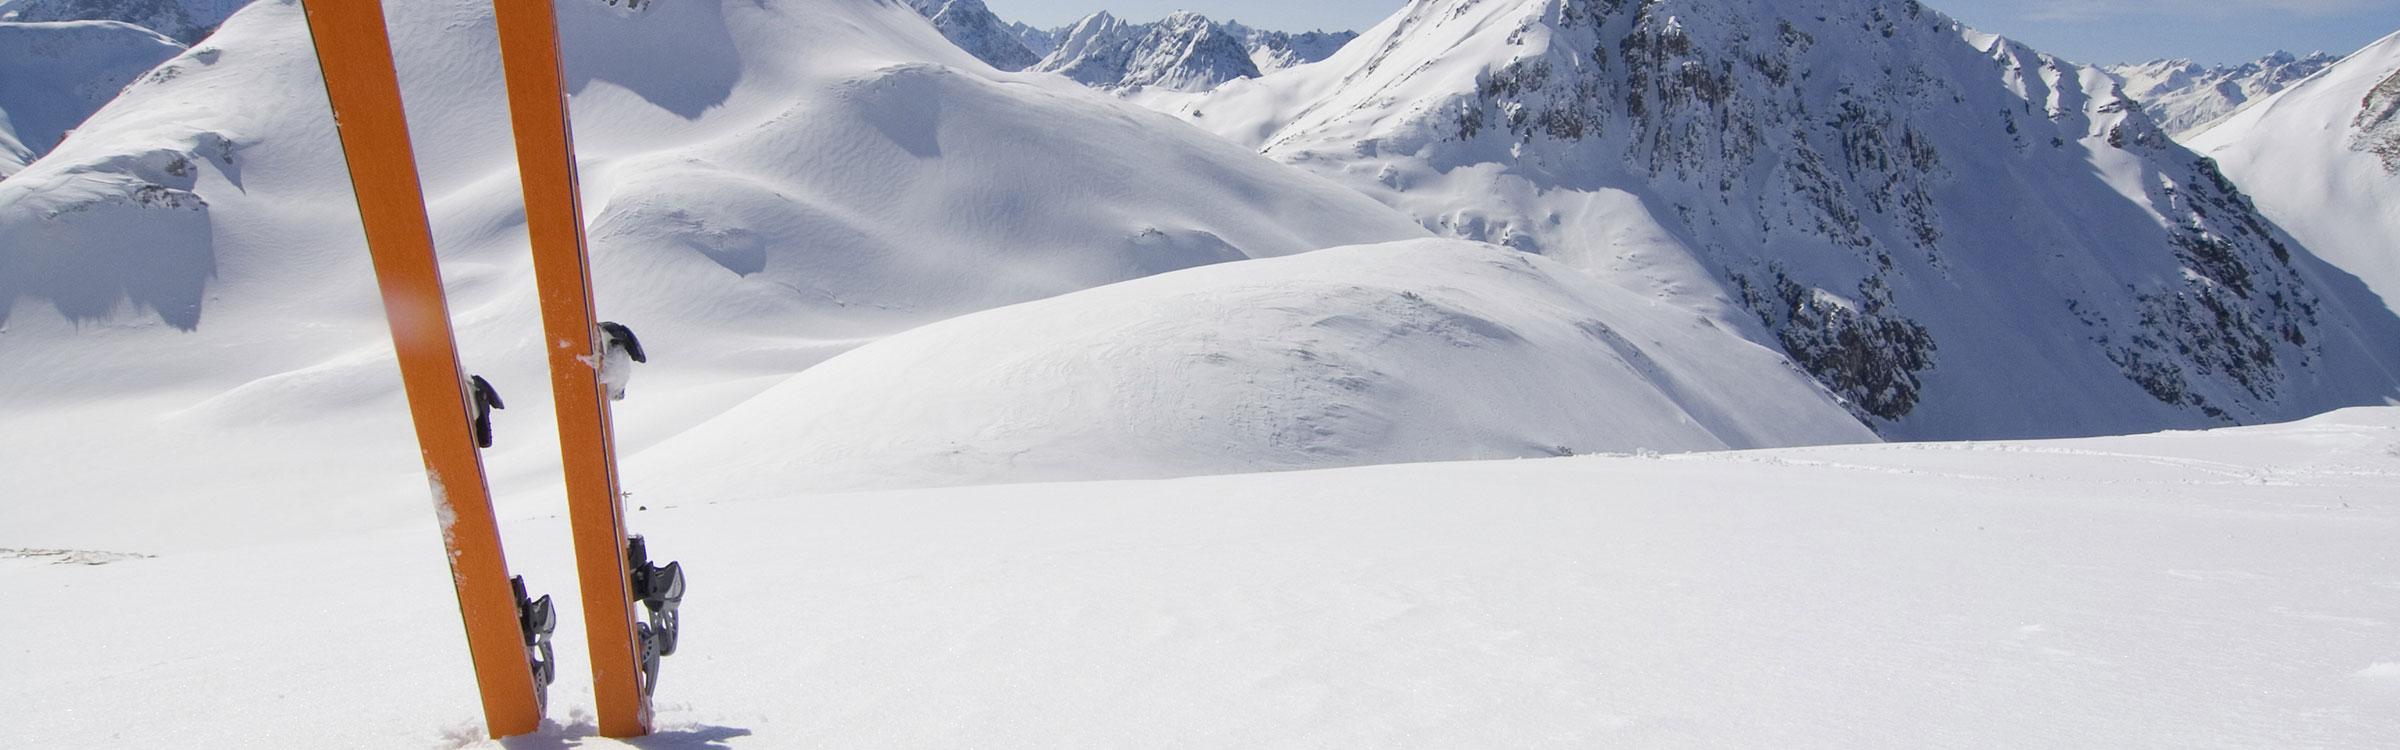 Ski istock 000003635016large